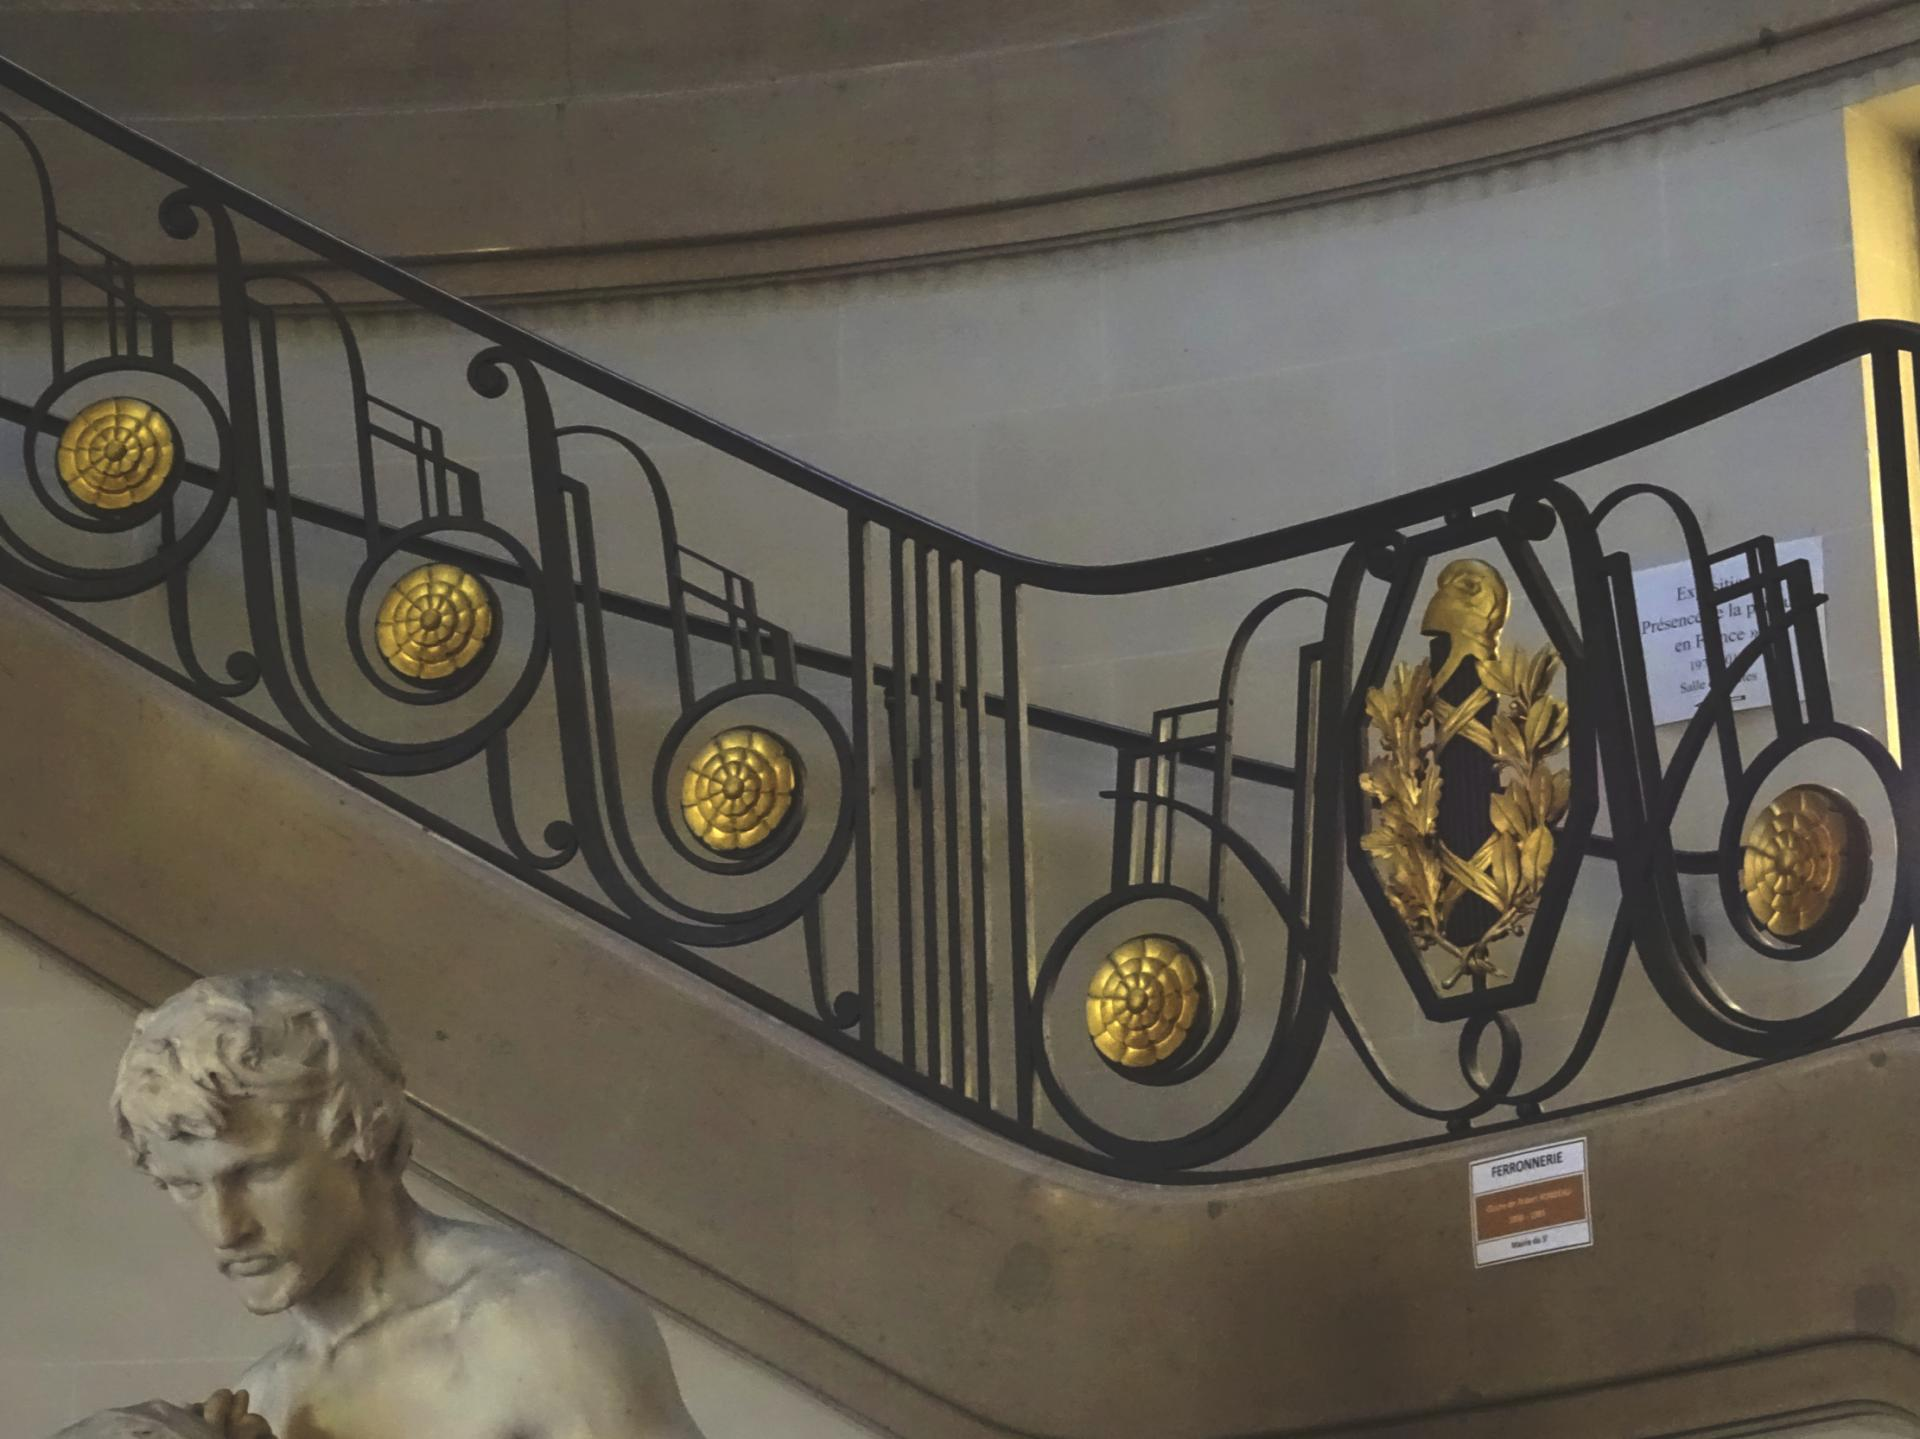 Escalier mairie 5 2